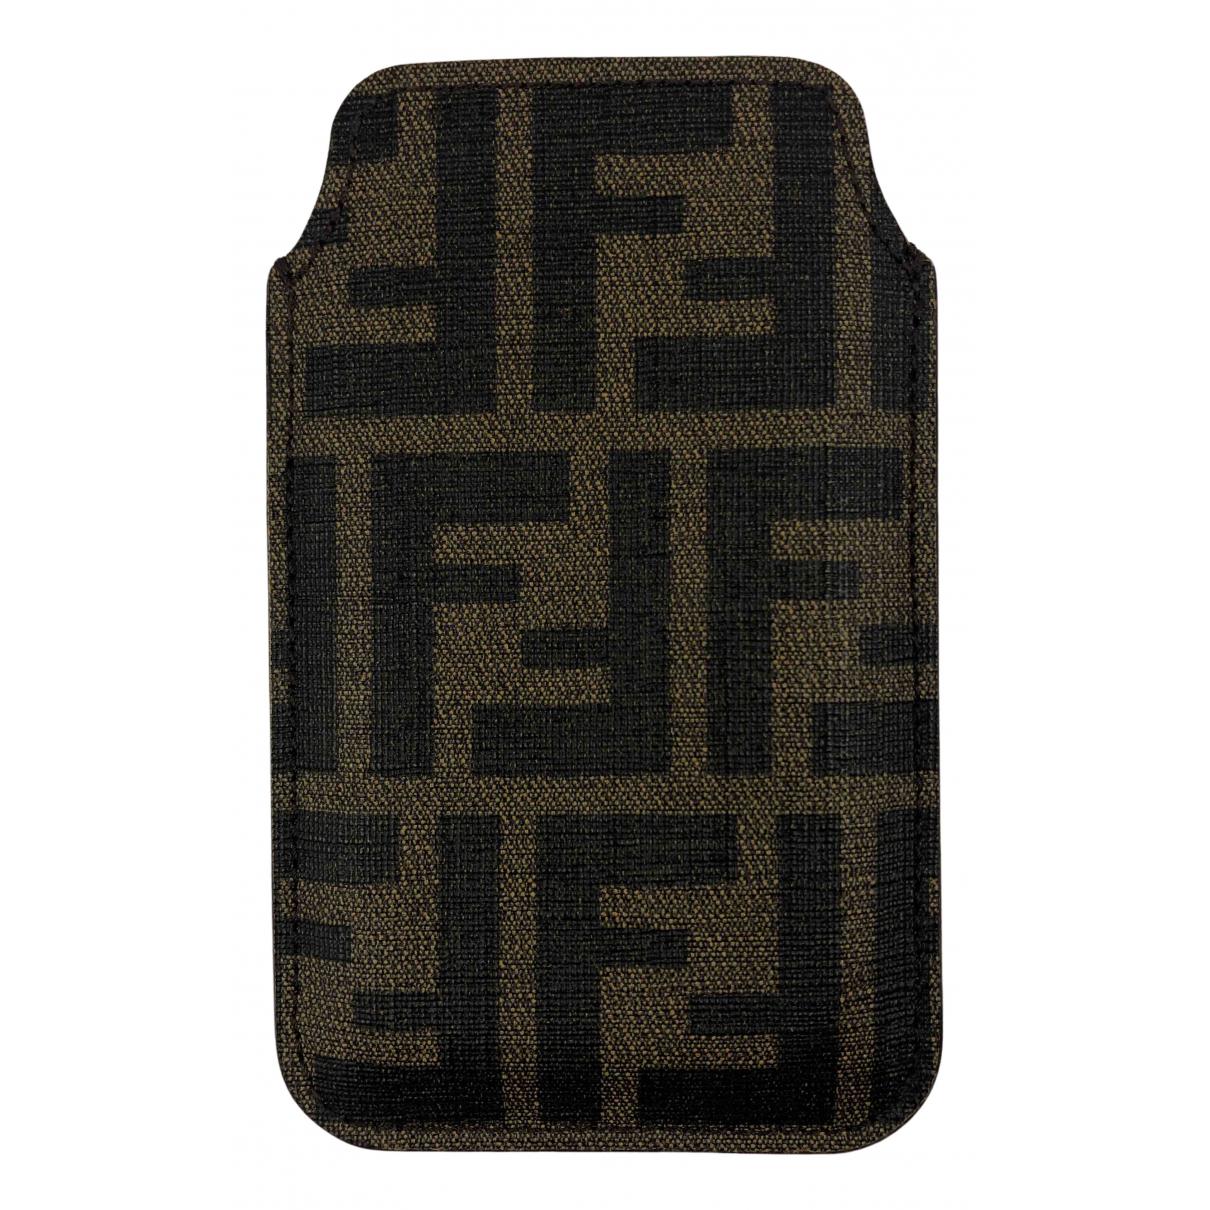 Fendi N Brown Cloth Accessories for Life & Living N